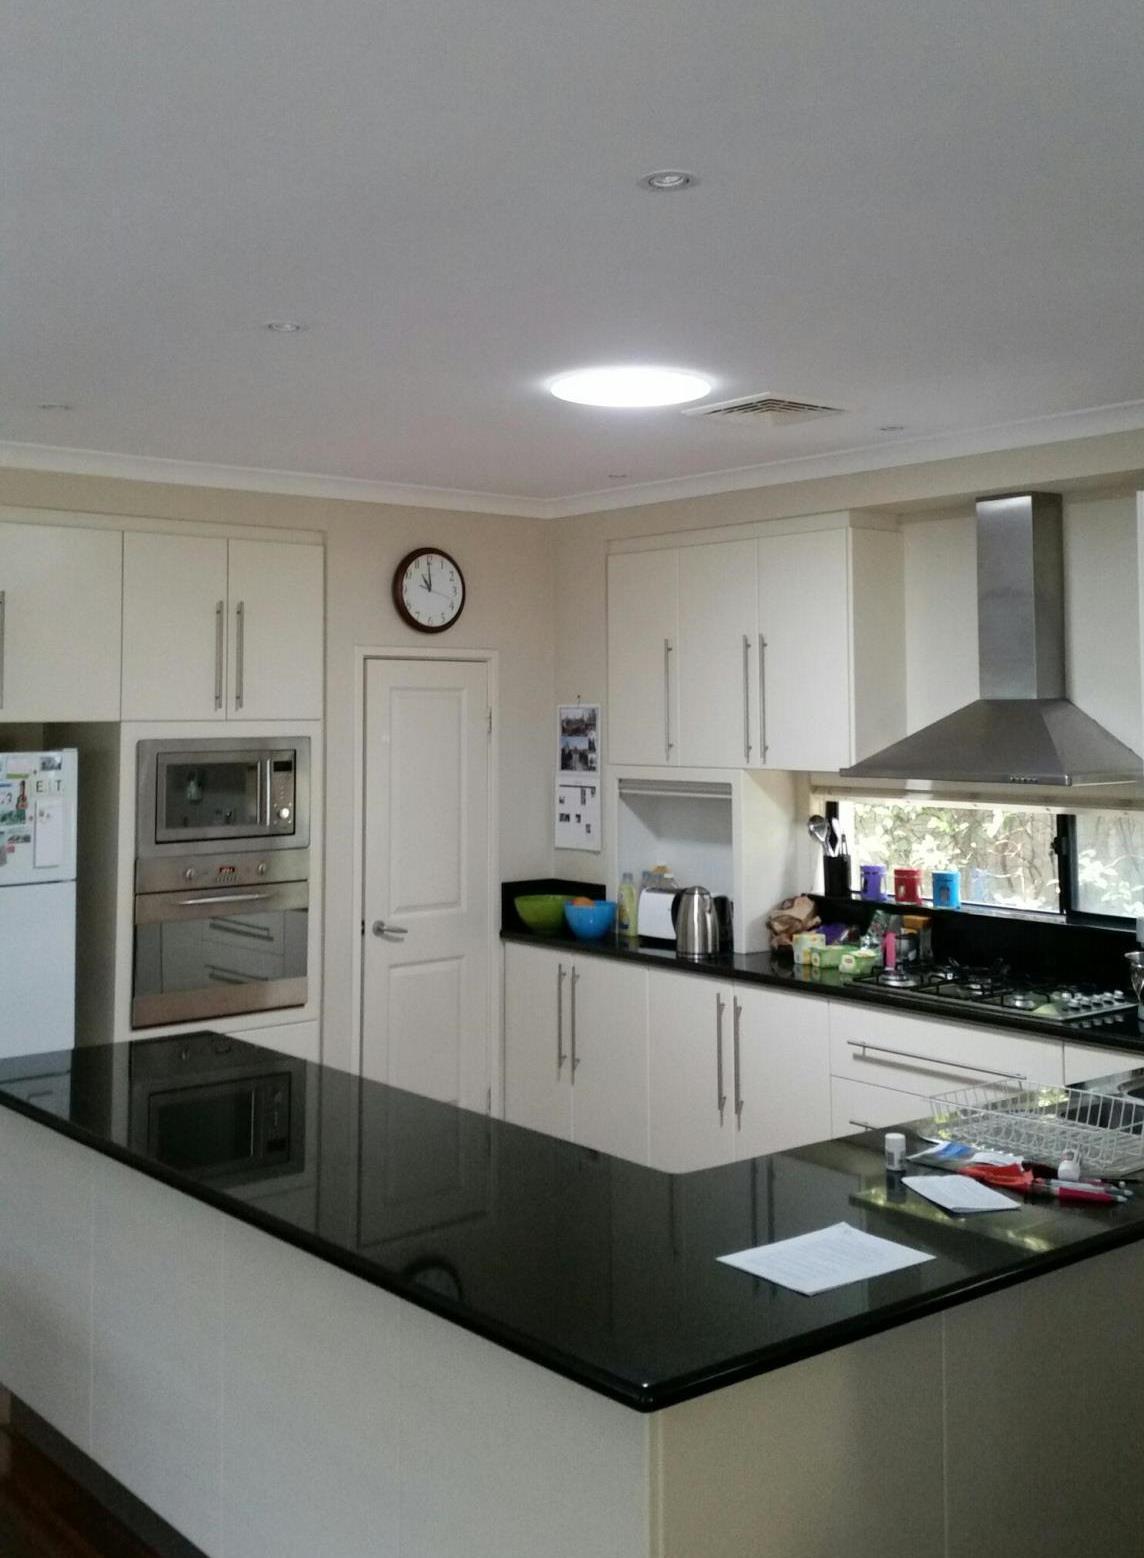 https://solatube.com.au/wp-content/uploads/2016/11/4-Kitchen-Adross-After-290DS.jpg